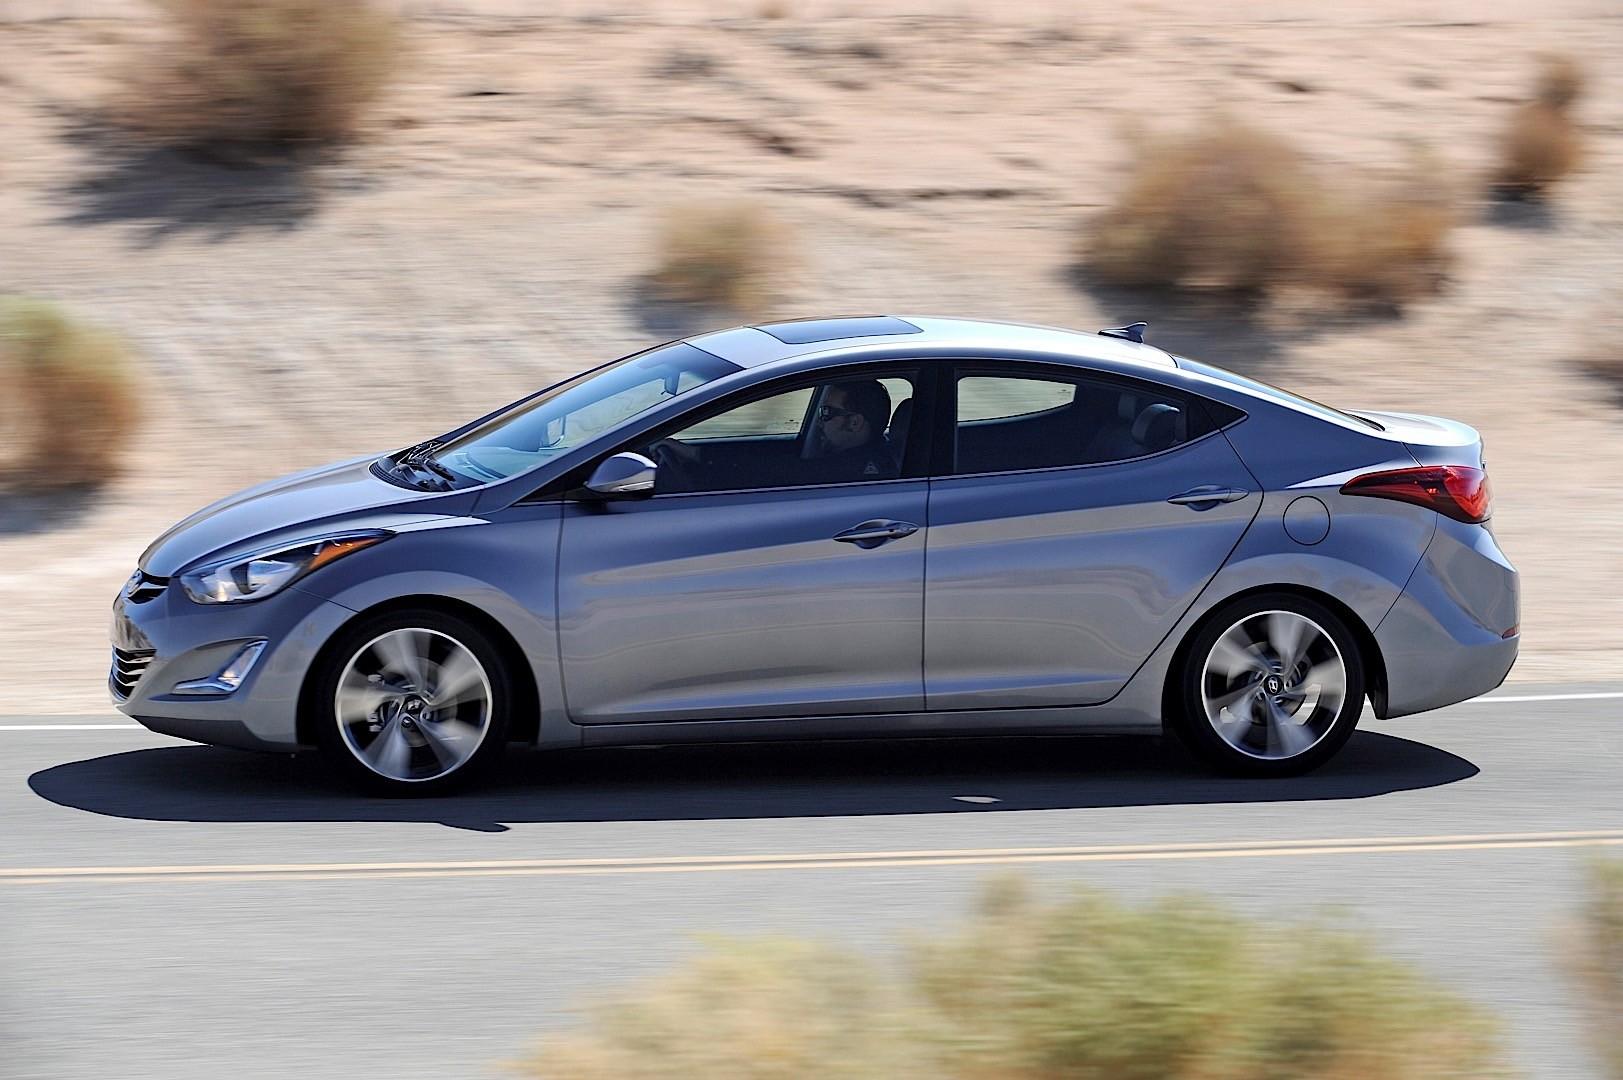 Hyundai Elantra 2010 2011 2012 2013 2014 2015 2016